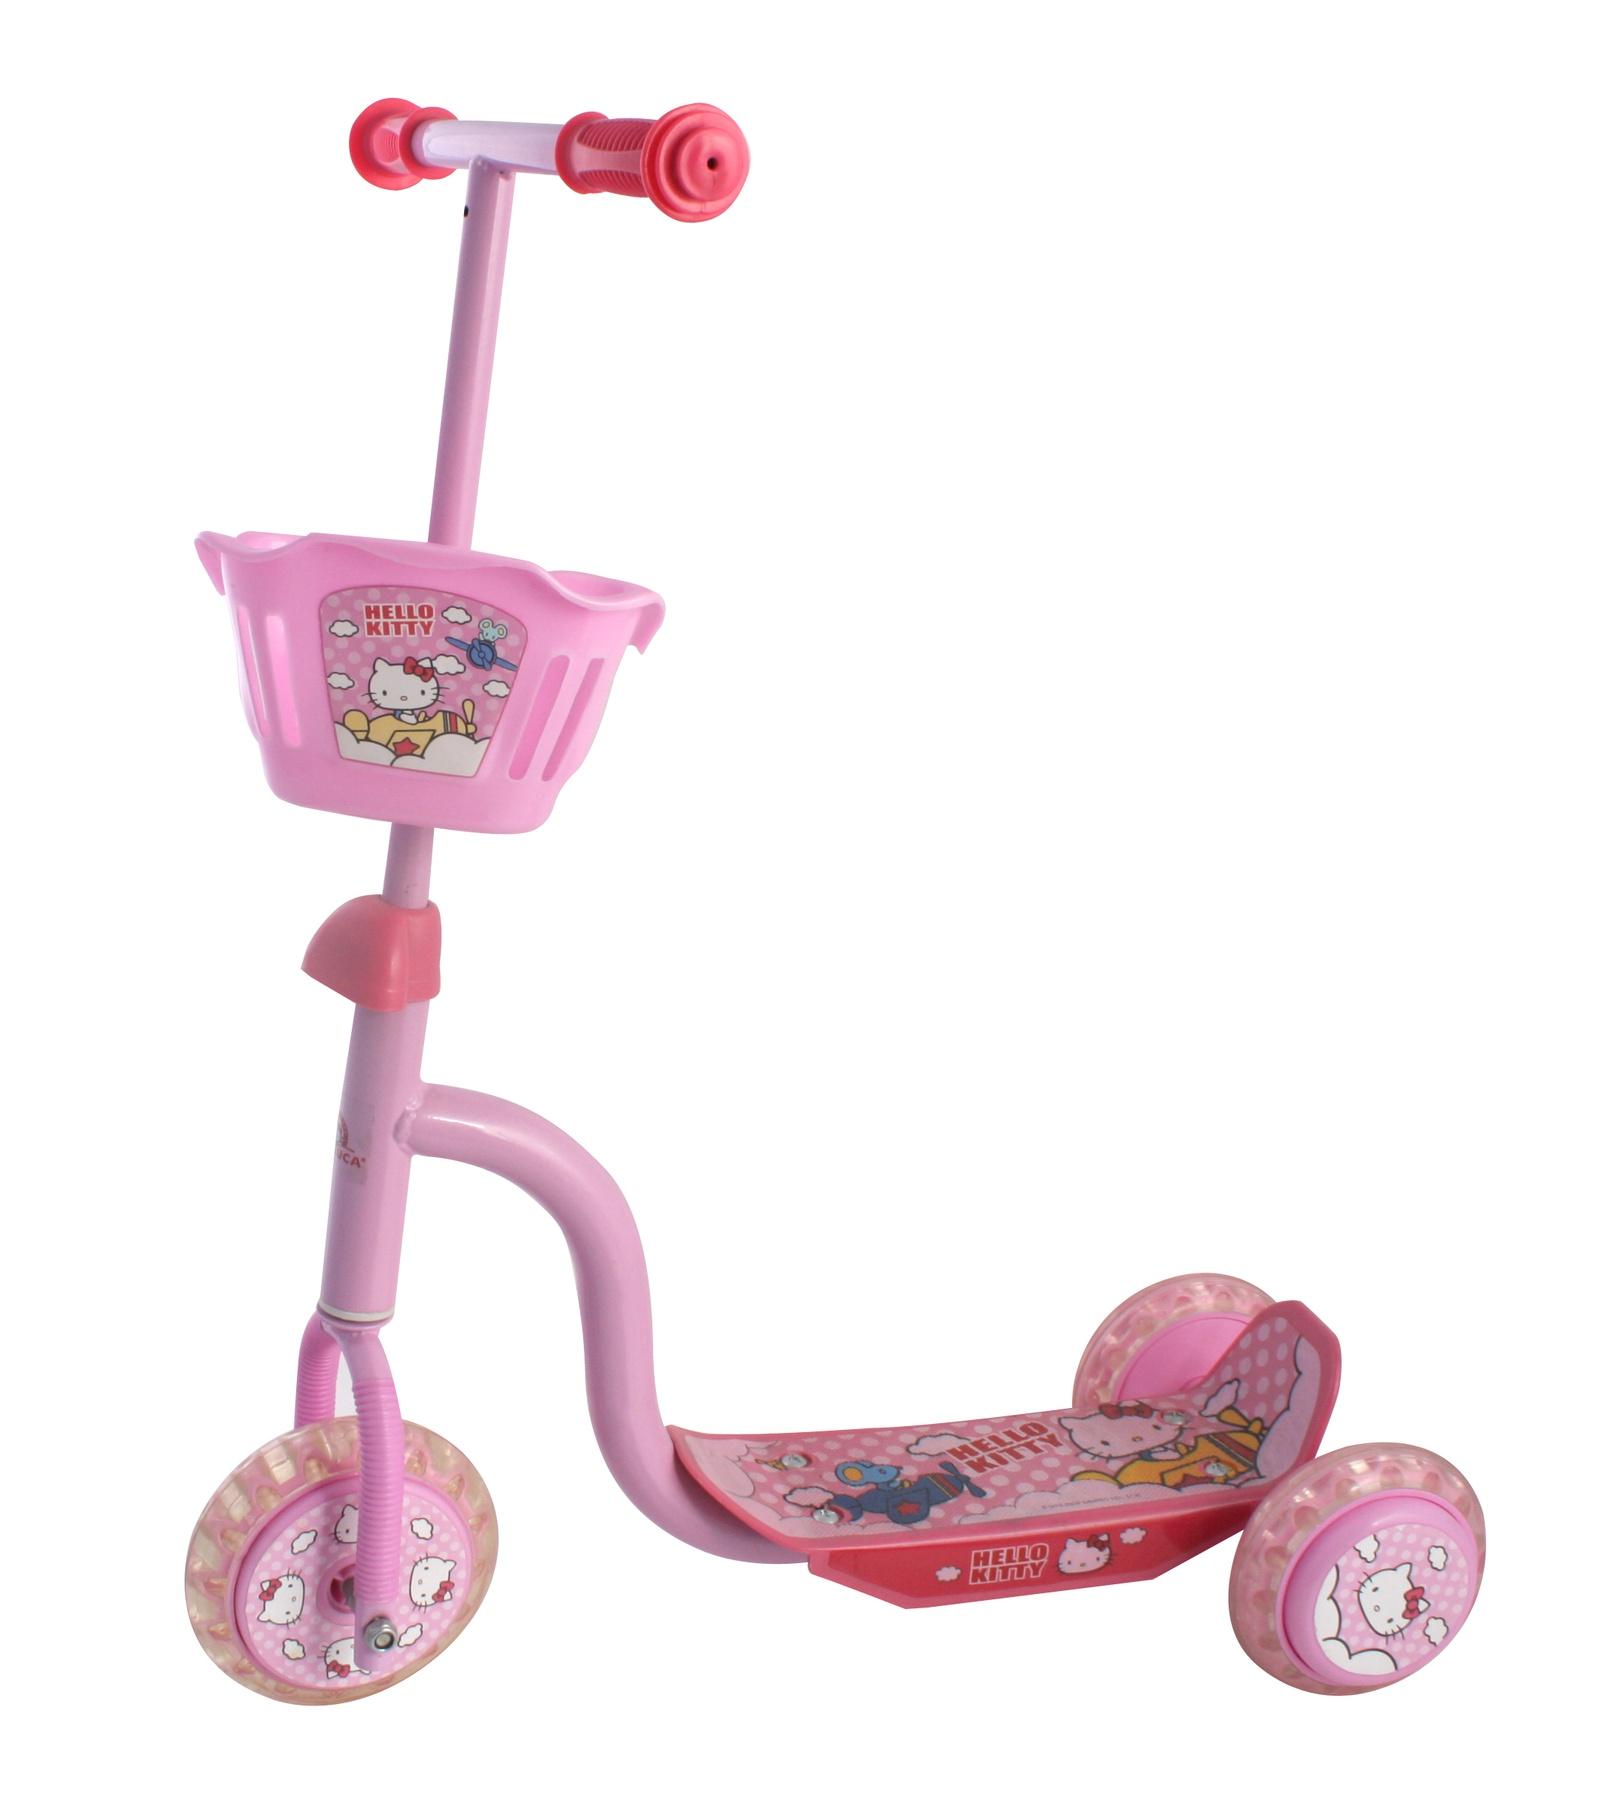 Самокат Hello Kitty детский HC1003-KC, розовый цена